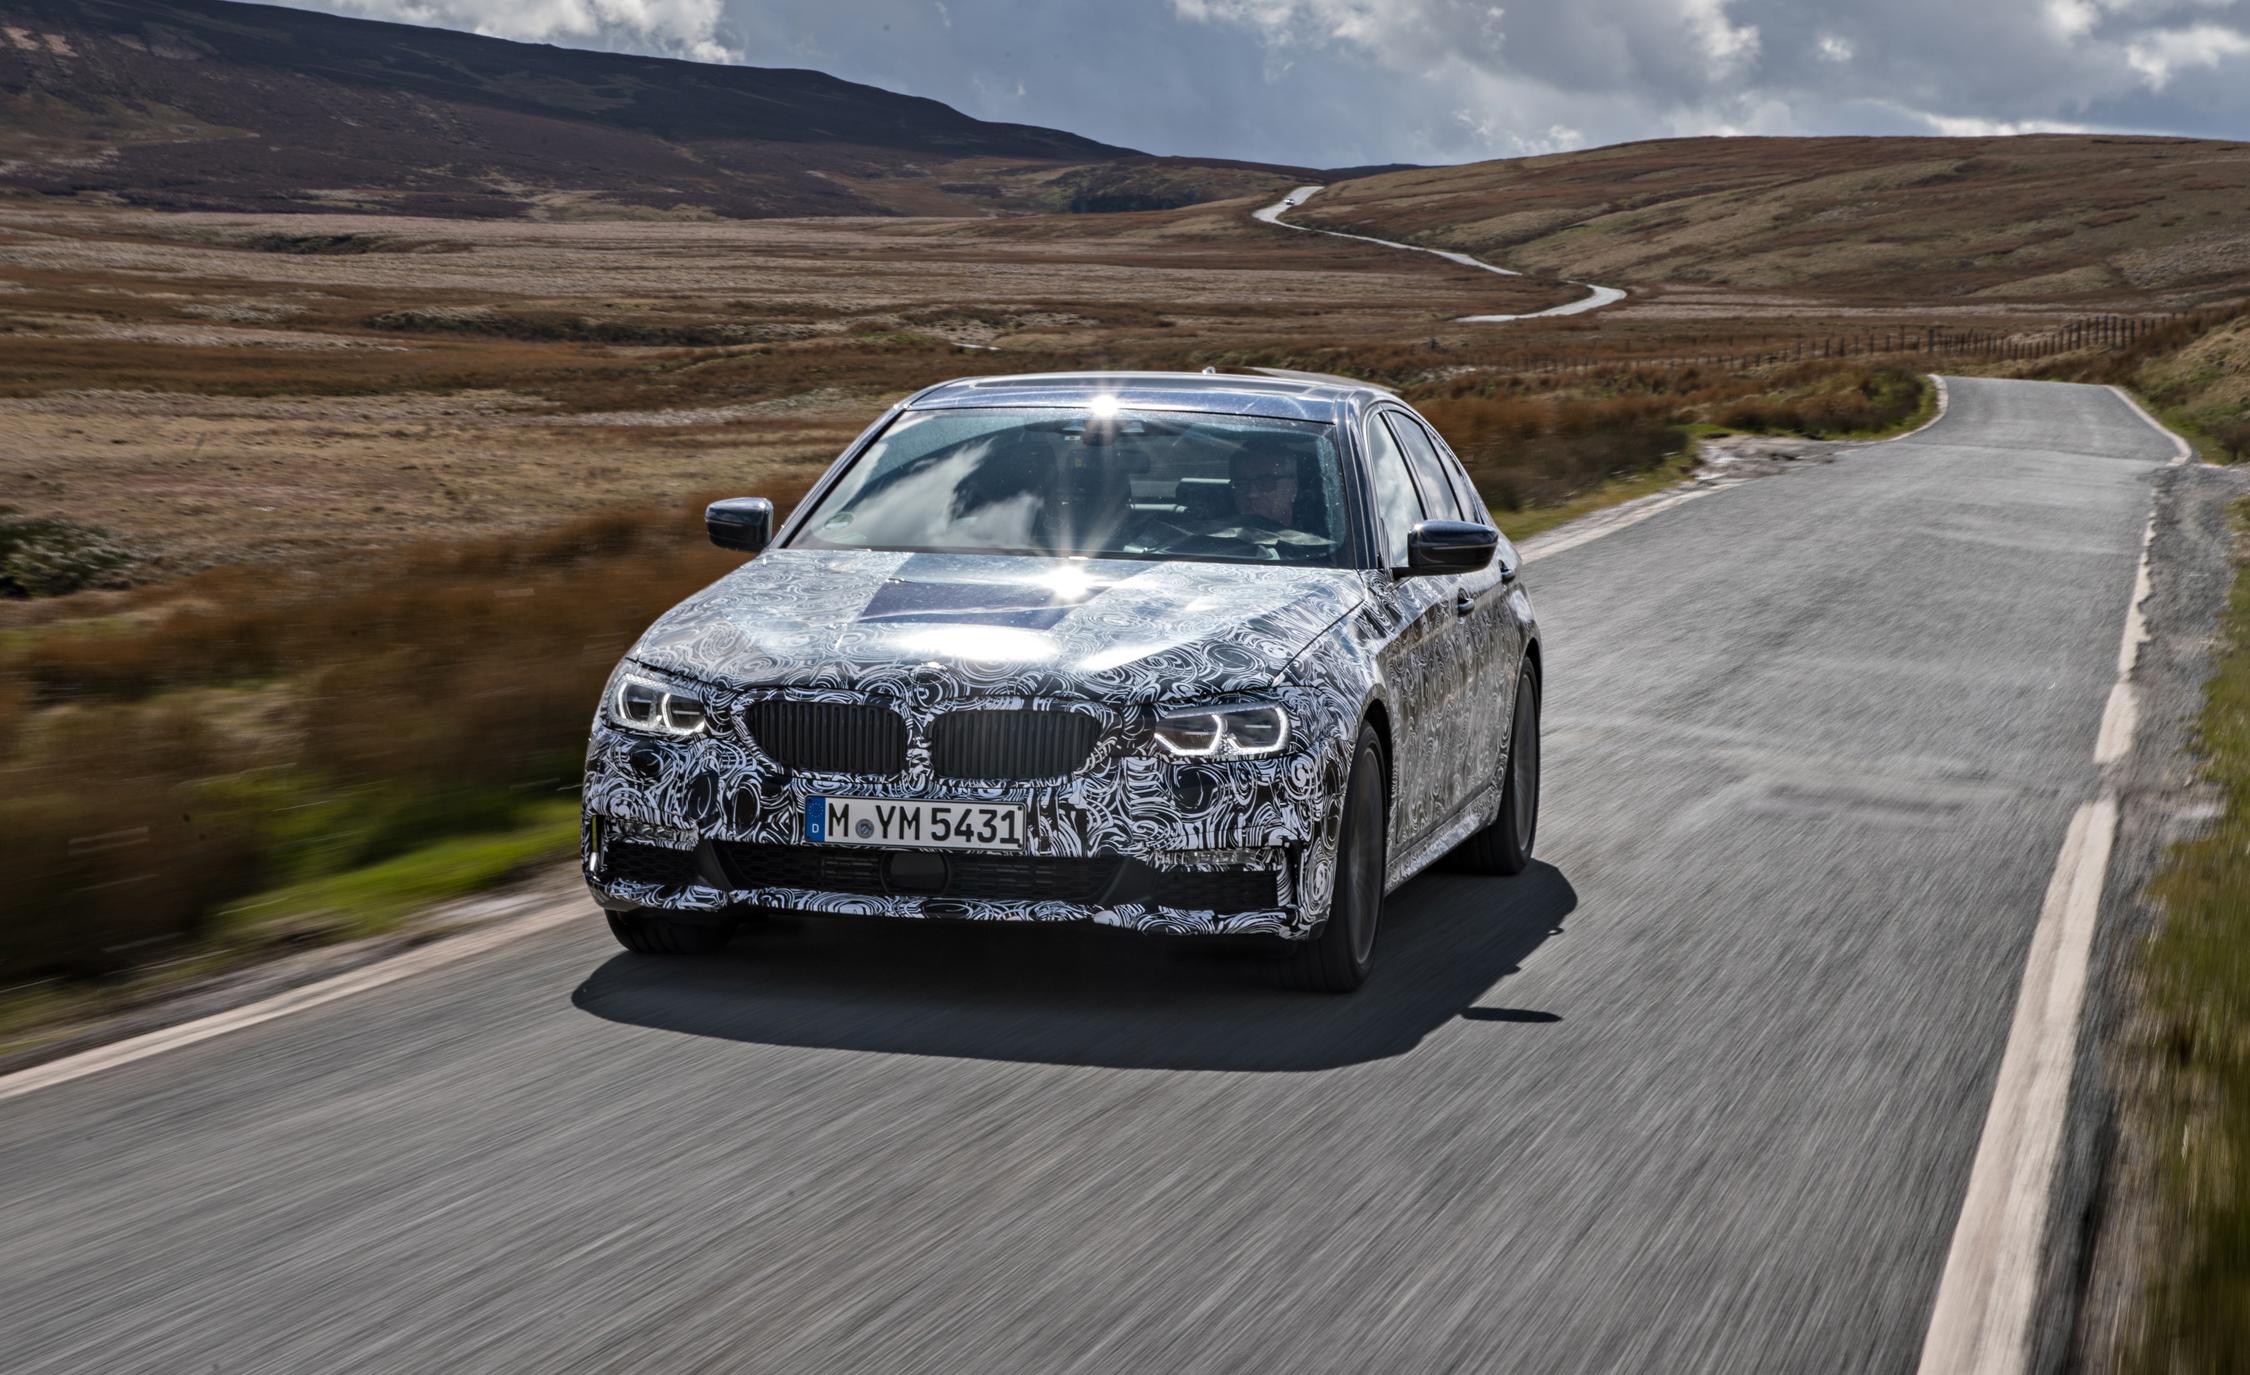 2016 - [BMW] Série 5 Berline & Touring [G30/G31] - Page 16 2018-BMW-5-series-prototype-108